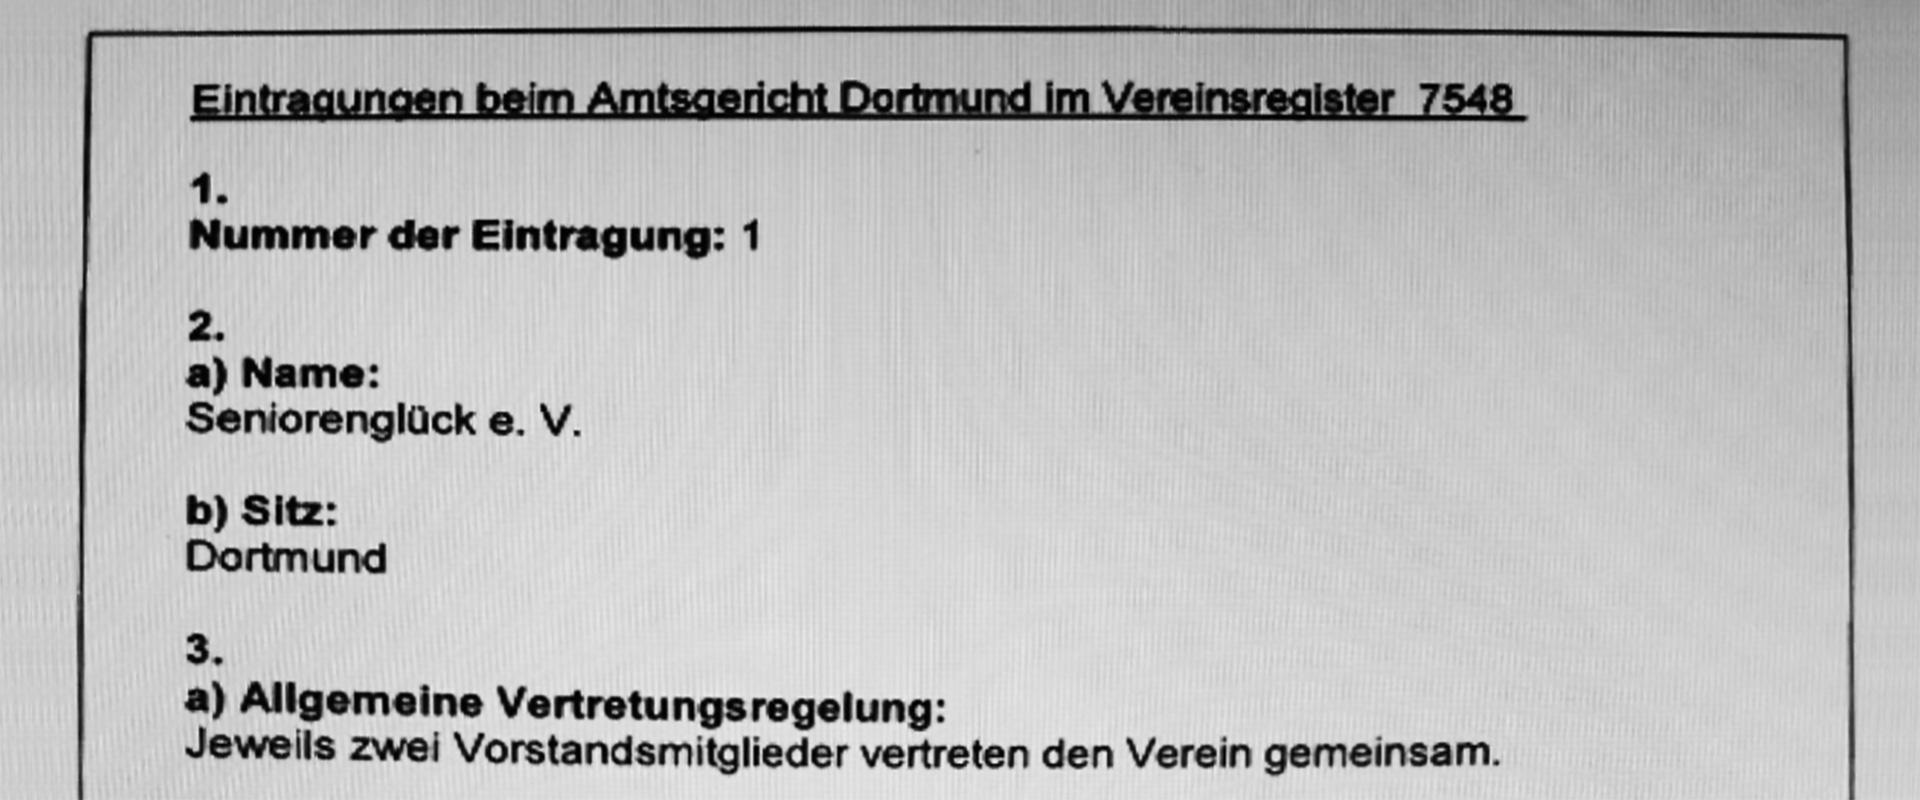 Eintrag des Seniorenglück e.V. ins Vereinsregister Nr. 7548 beim Amtsgericht Dortmund - Titelbild